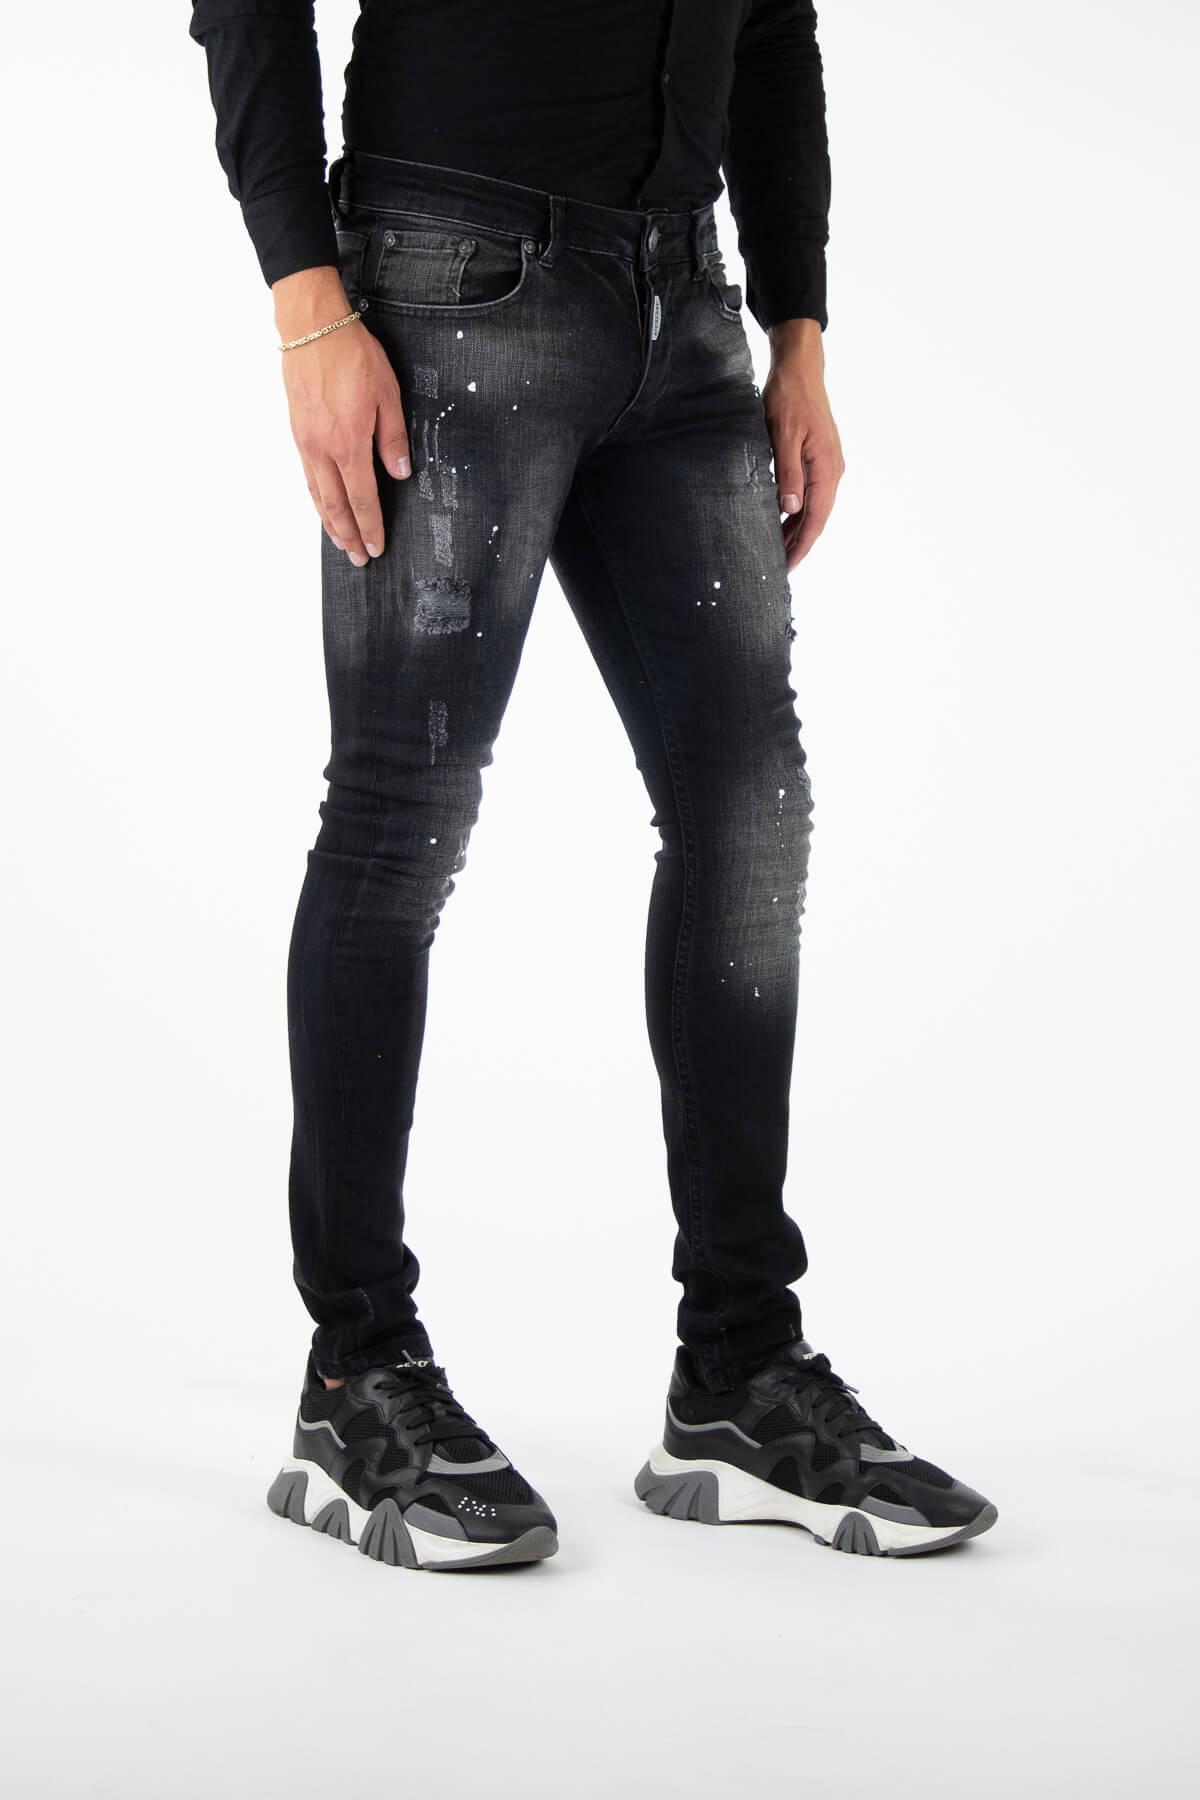 Alicante Deluxe Black Jeans-2